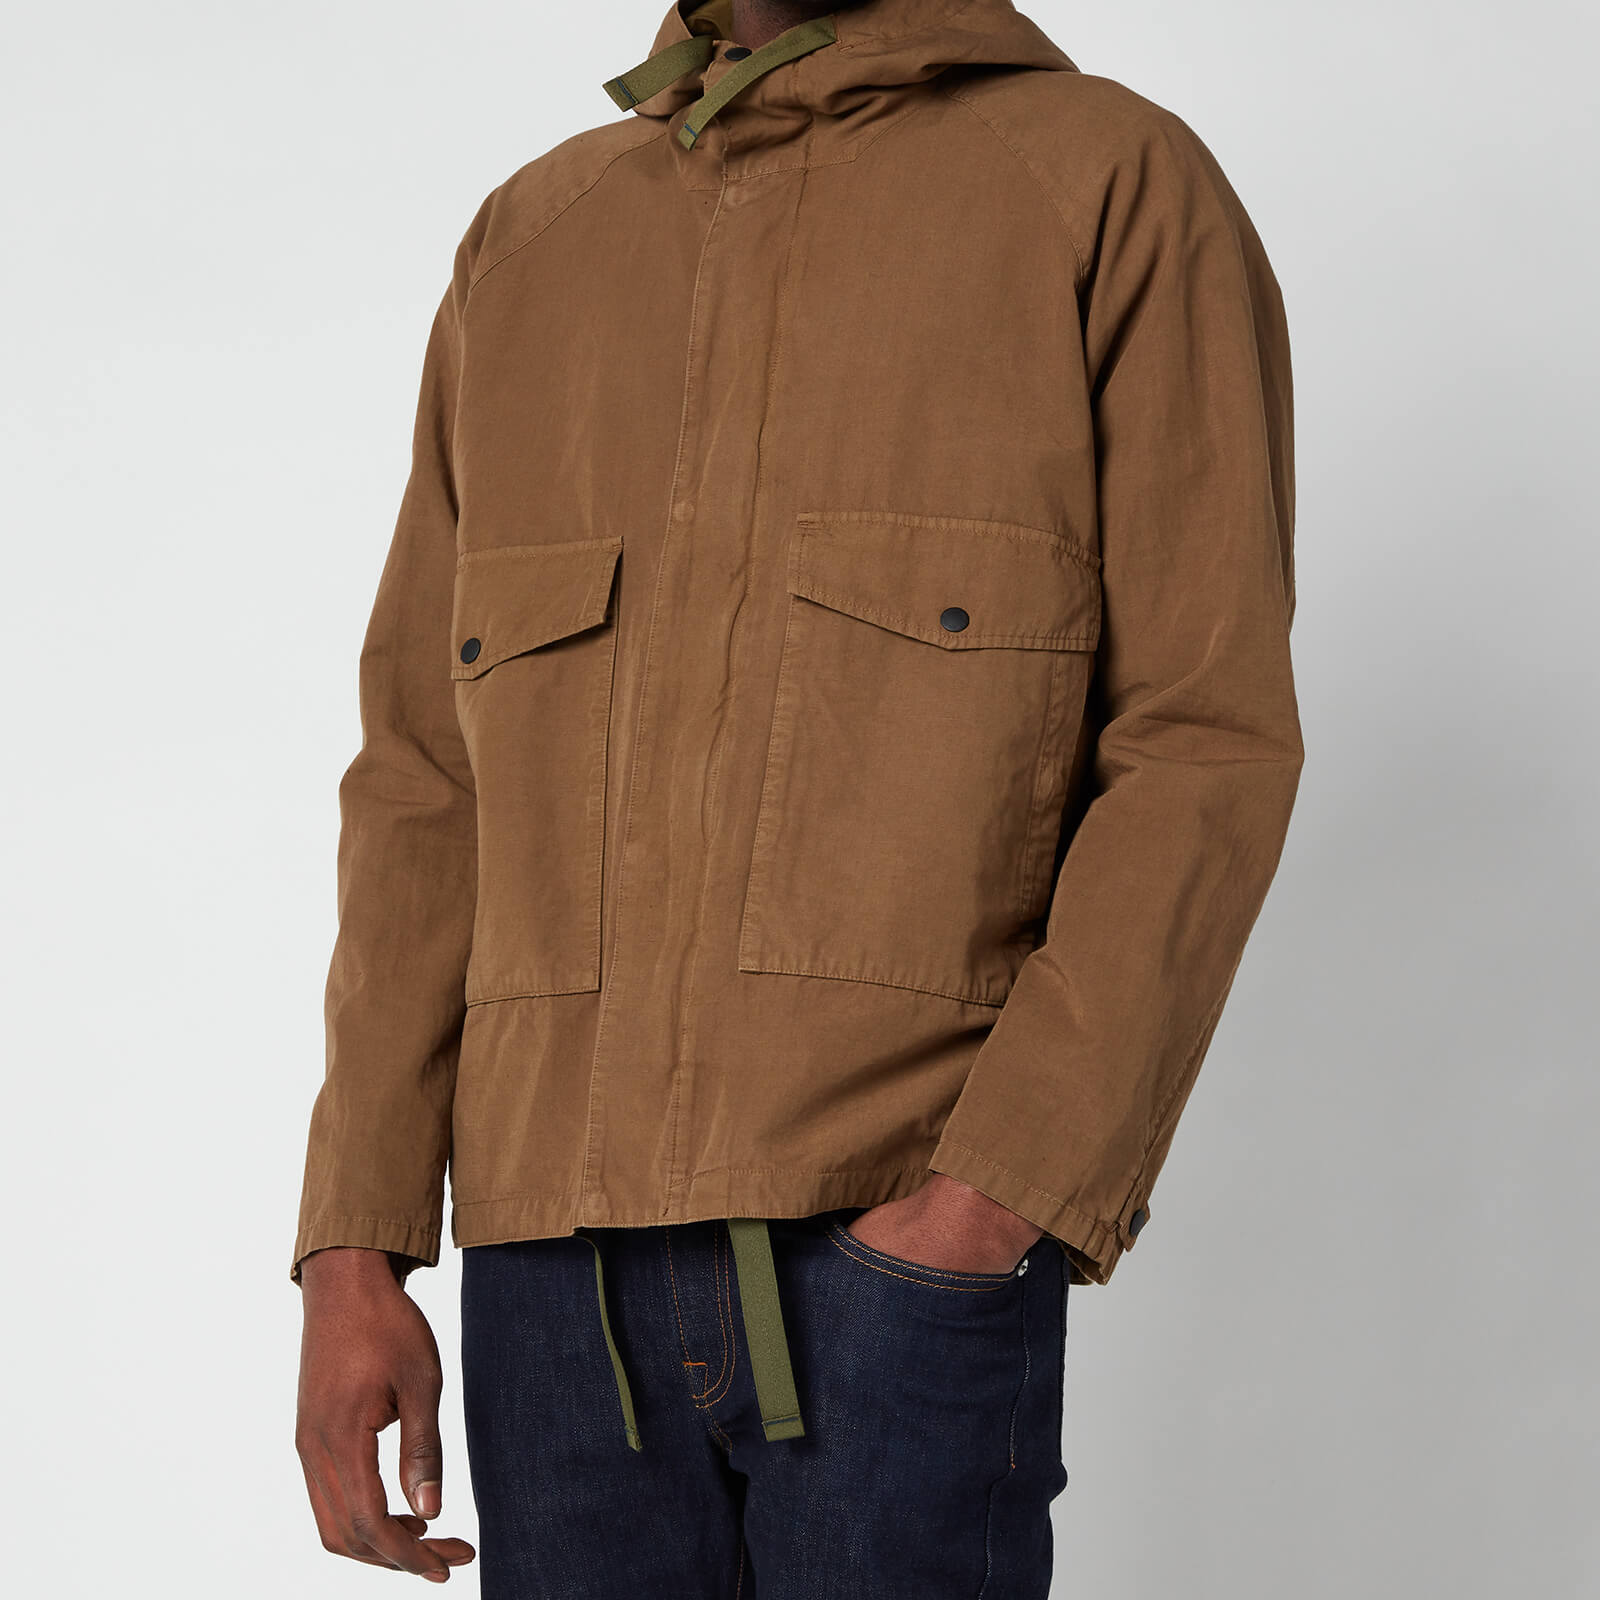 PS Paul Smith Men's Hooded Jacket - Tan - S